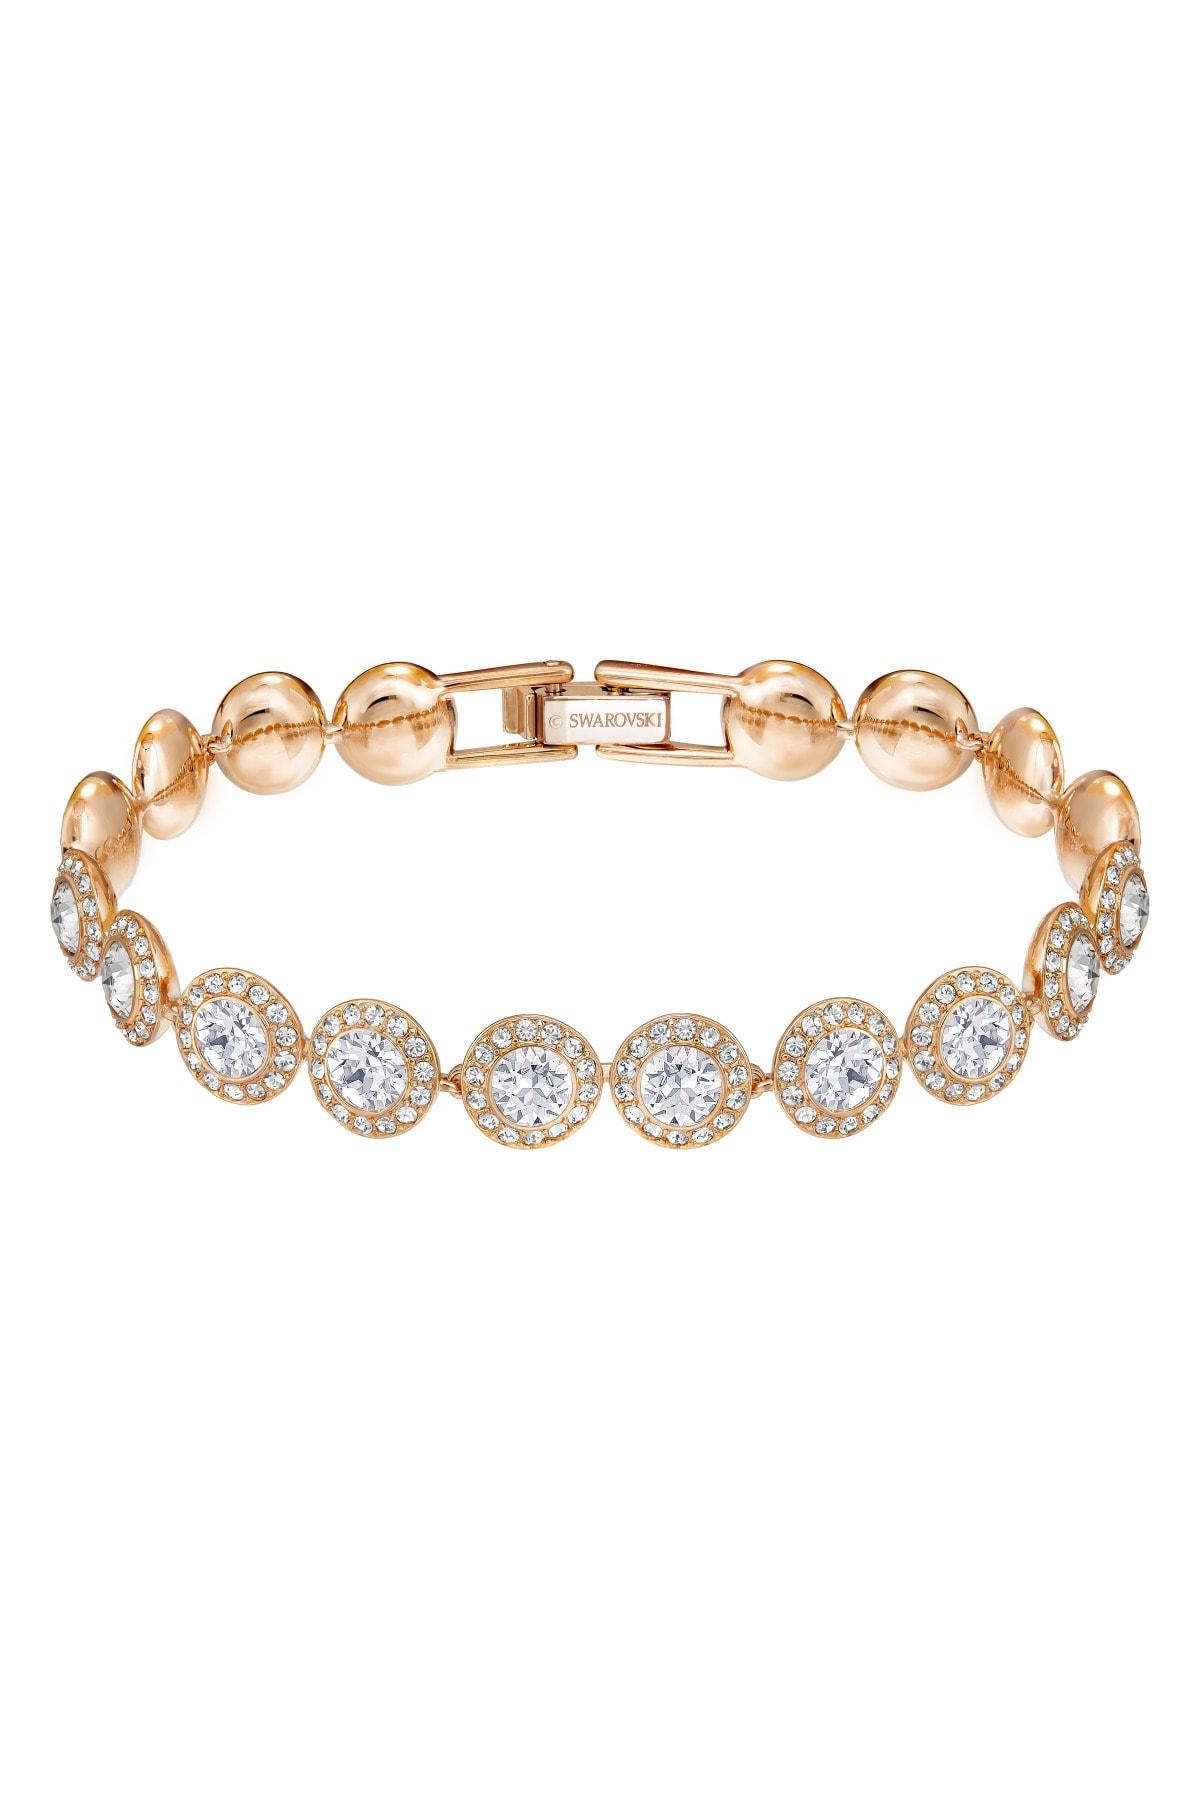 Swarovski Bilezik Angelic:bracelet Cry/ros M 5240513 1